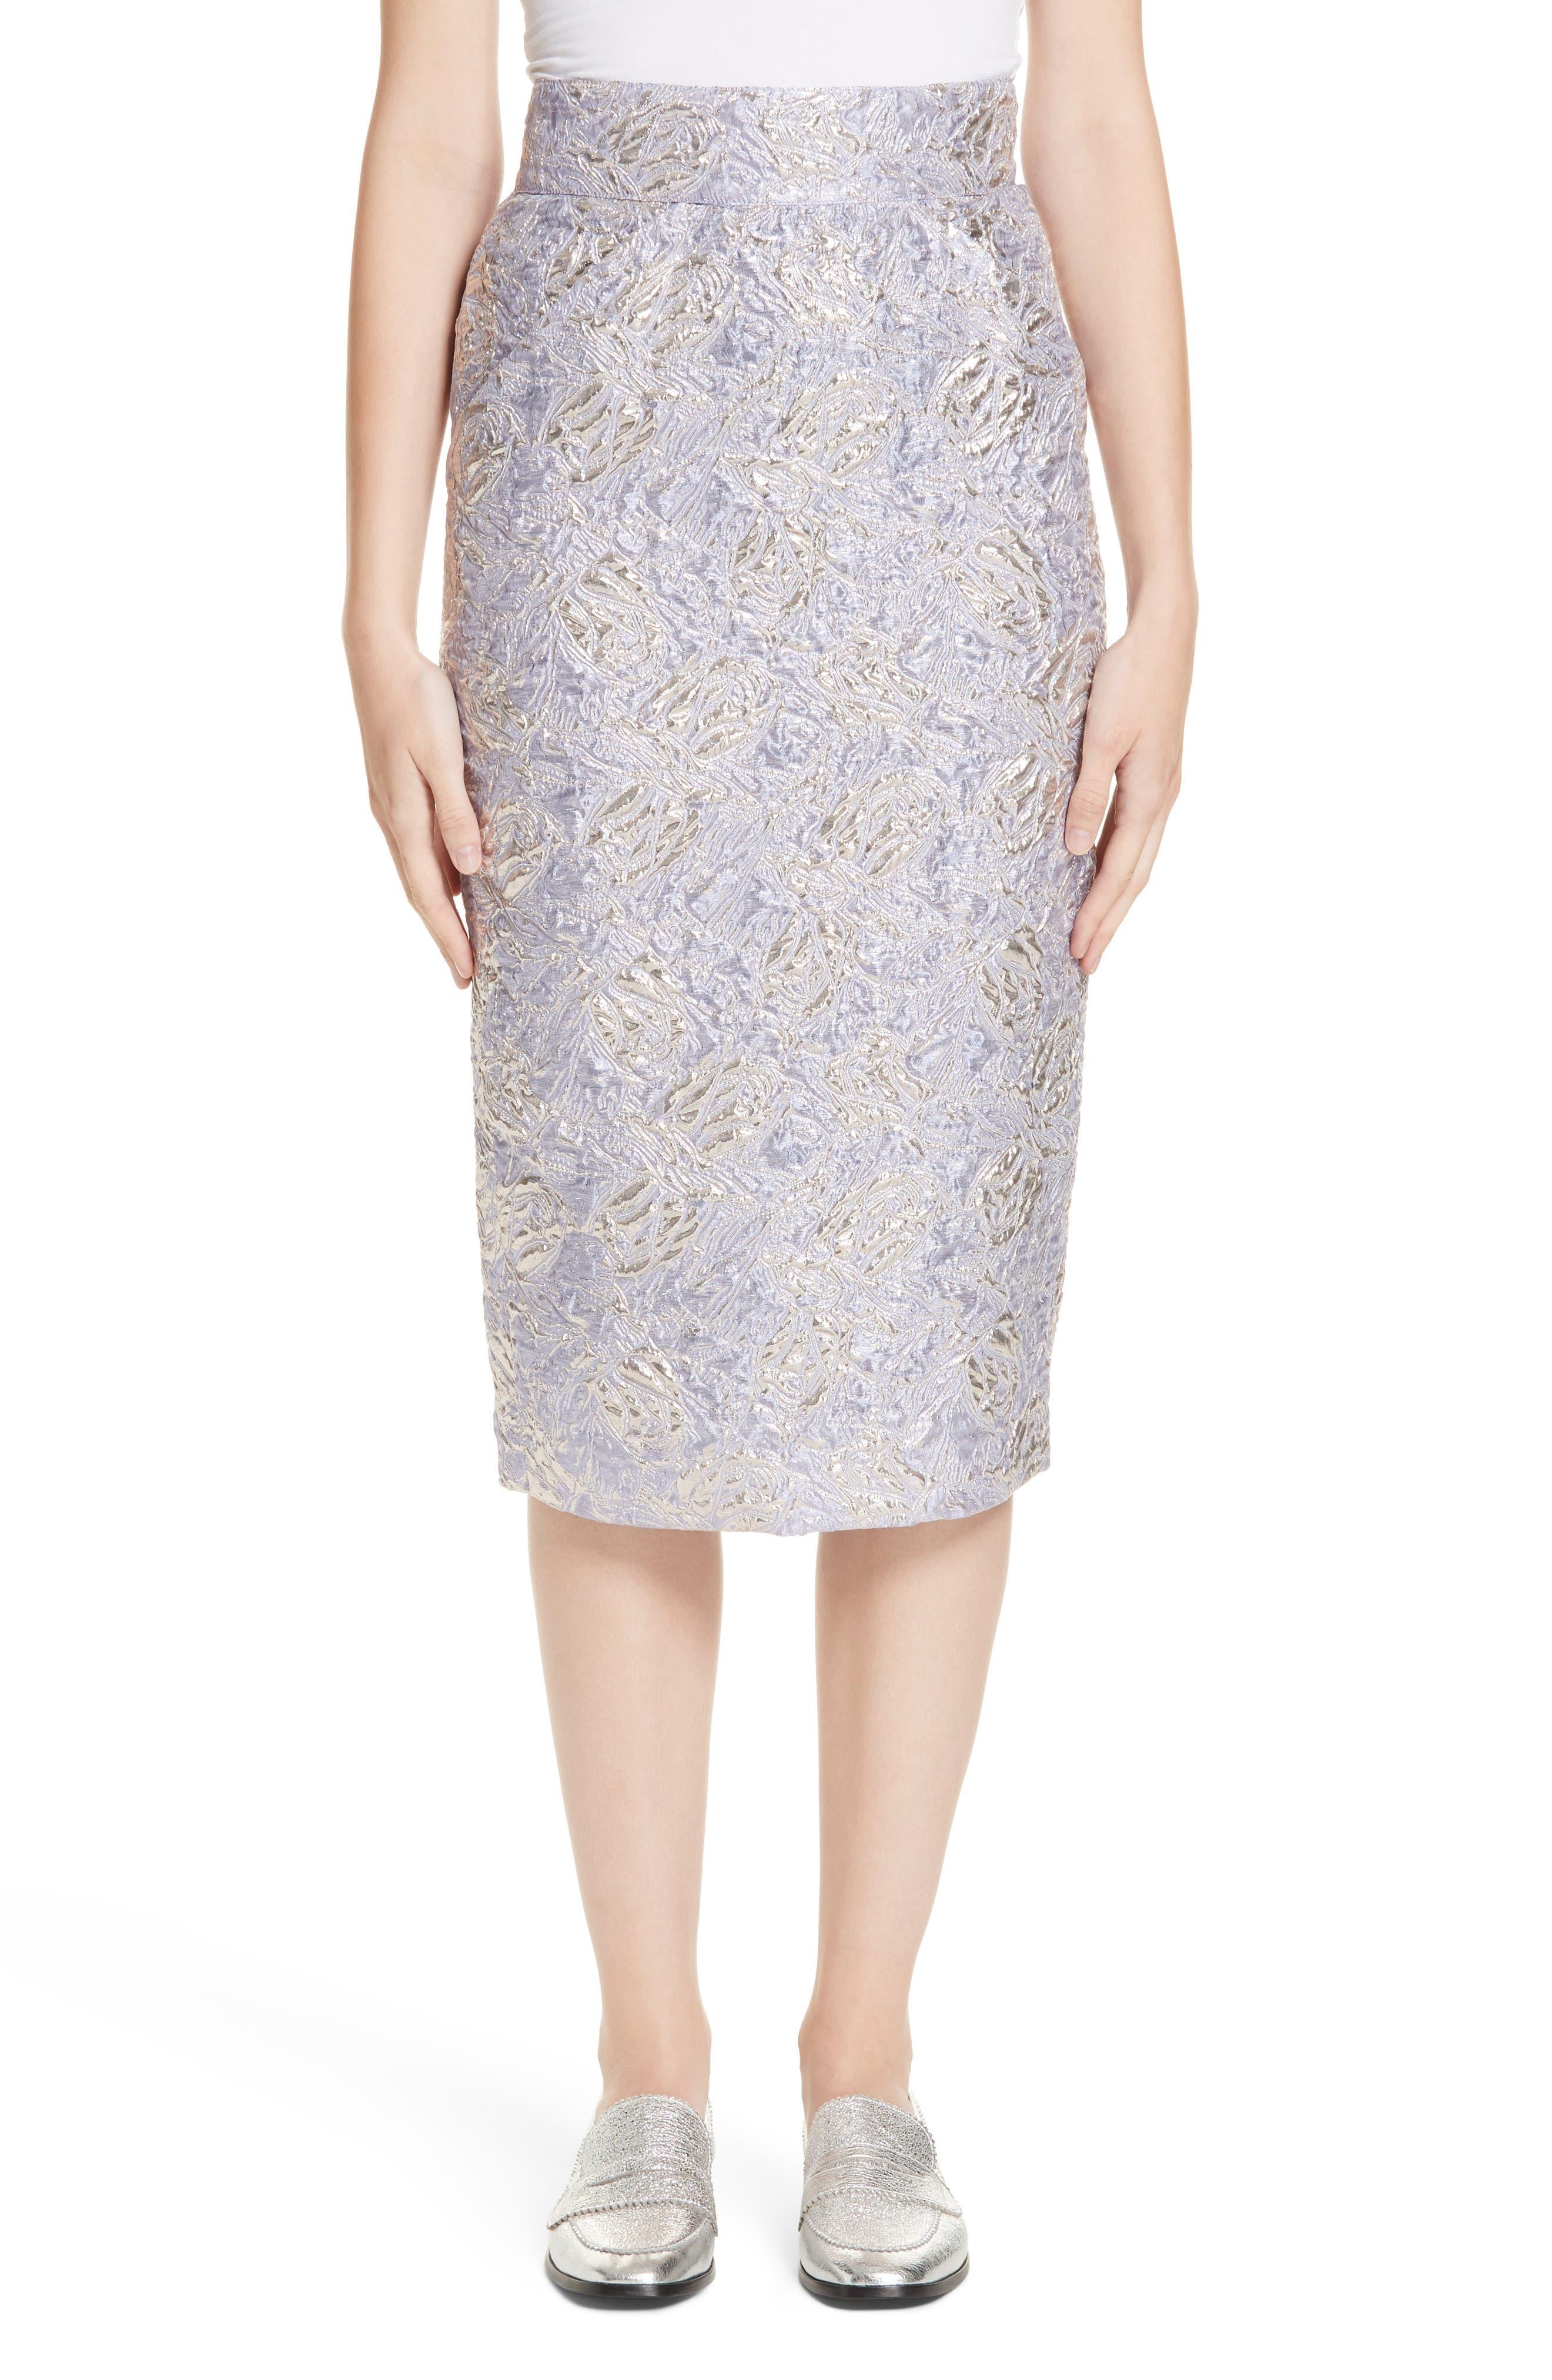 ROSEANNA Lauren Brocade Pencil Skirt in Lilas